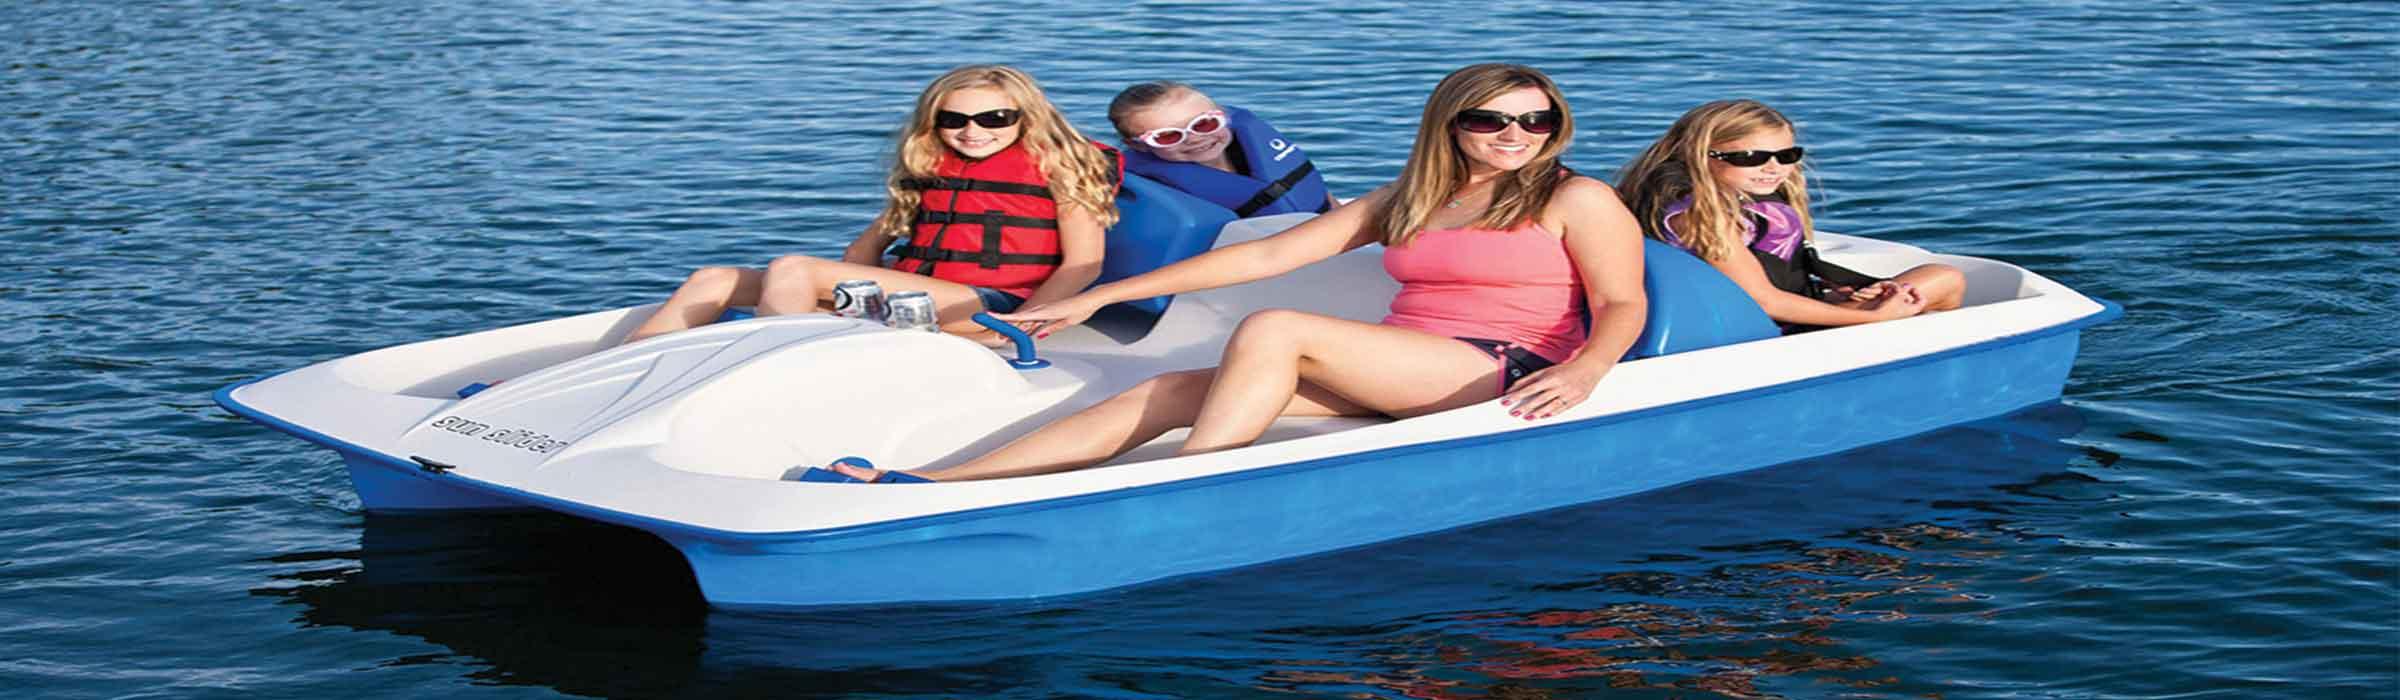 casino paddle boat